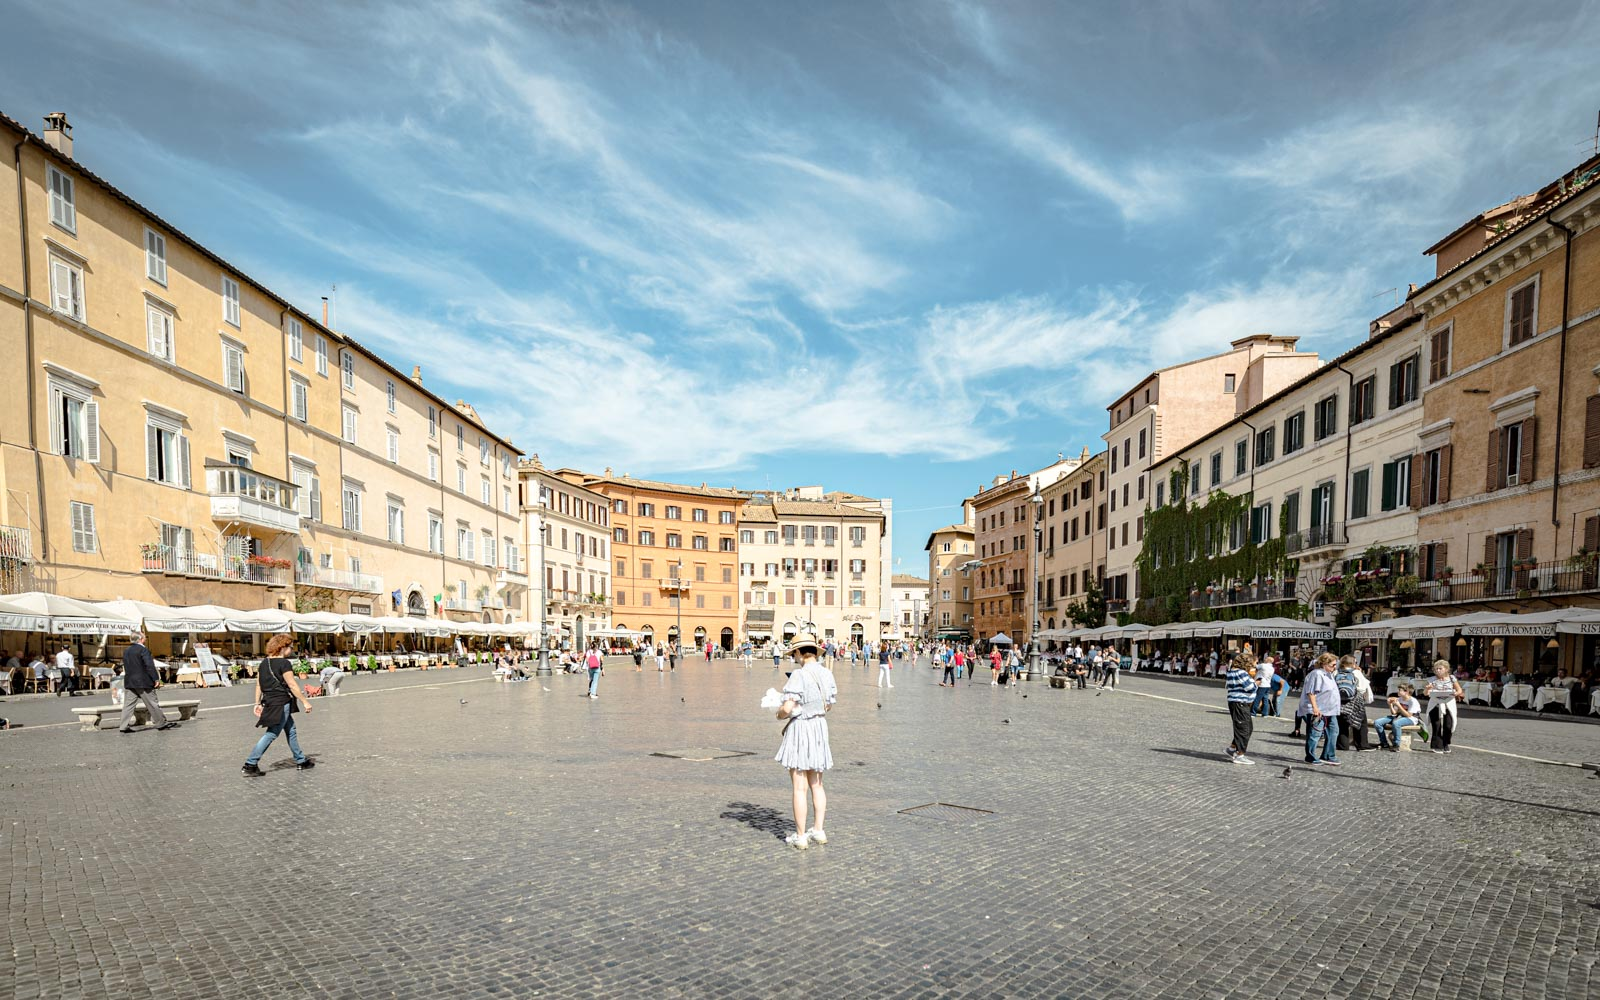 Piazze di Roma